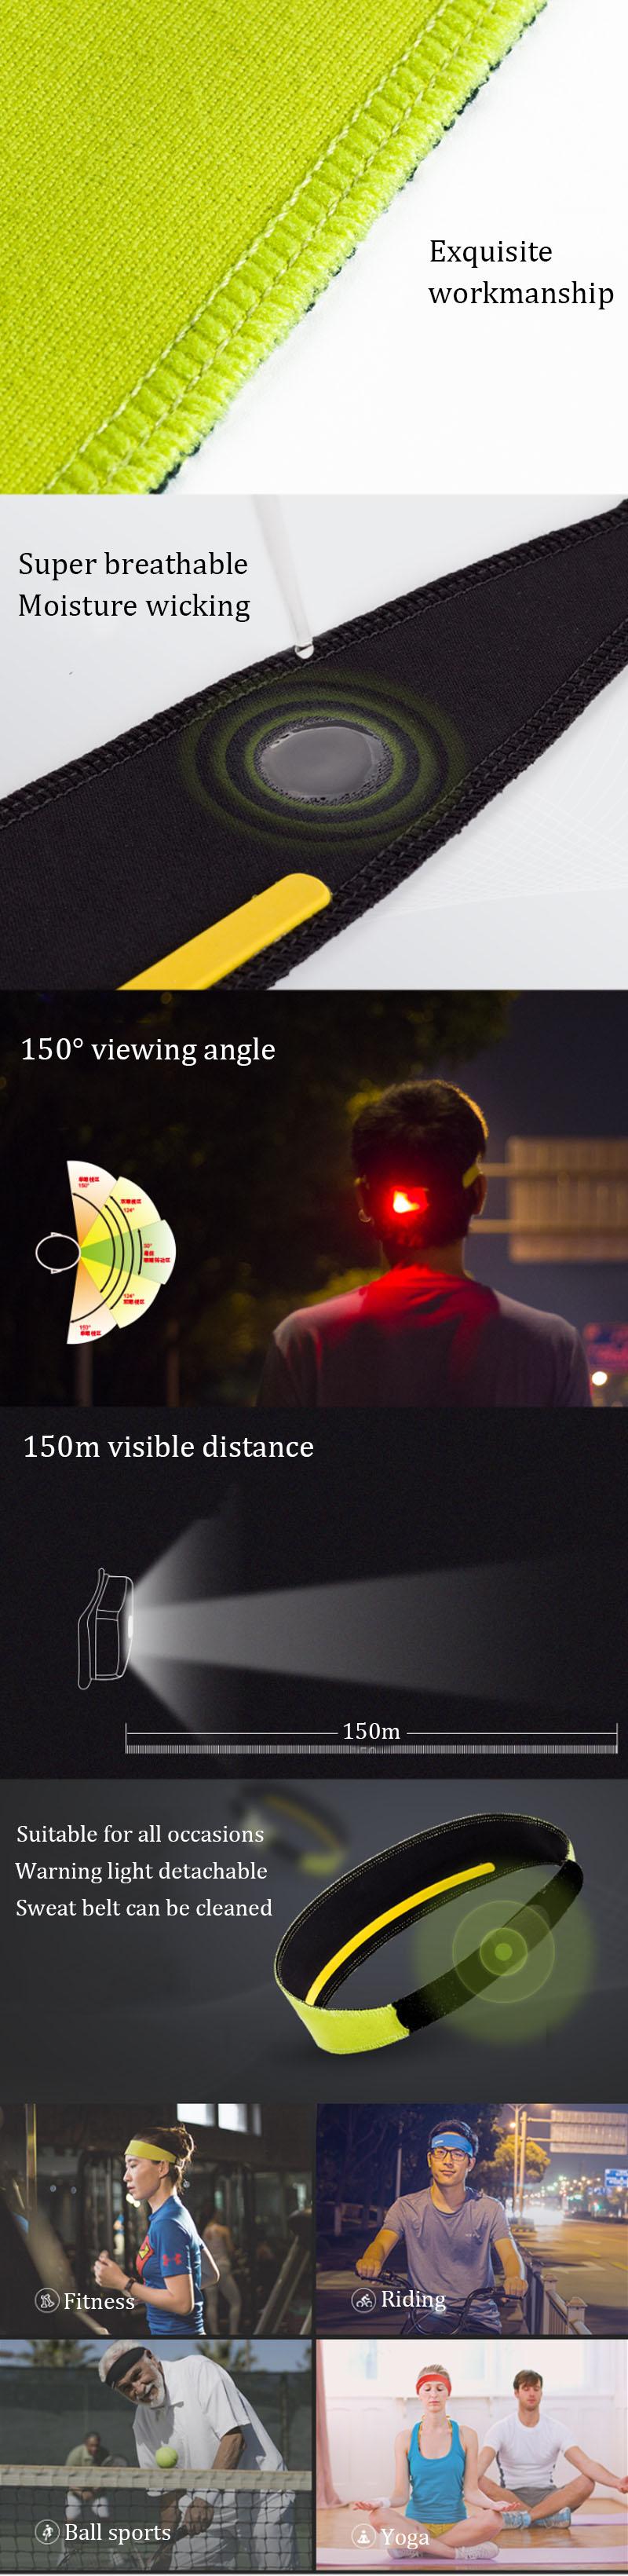 SUNREI Sport Headband Outdoor Running Belt Fitness Yoga Antiperspirant Band With Warning Light